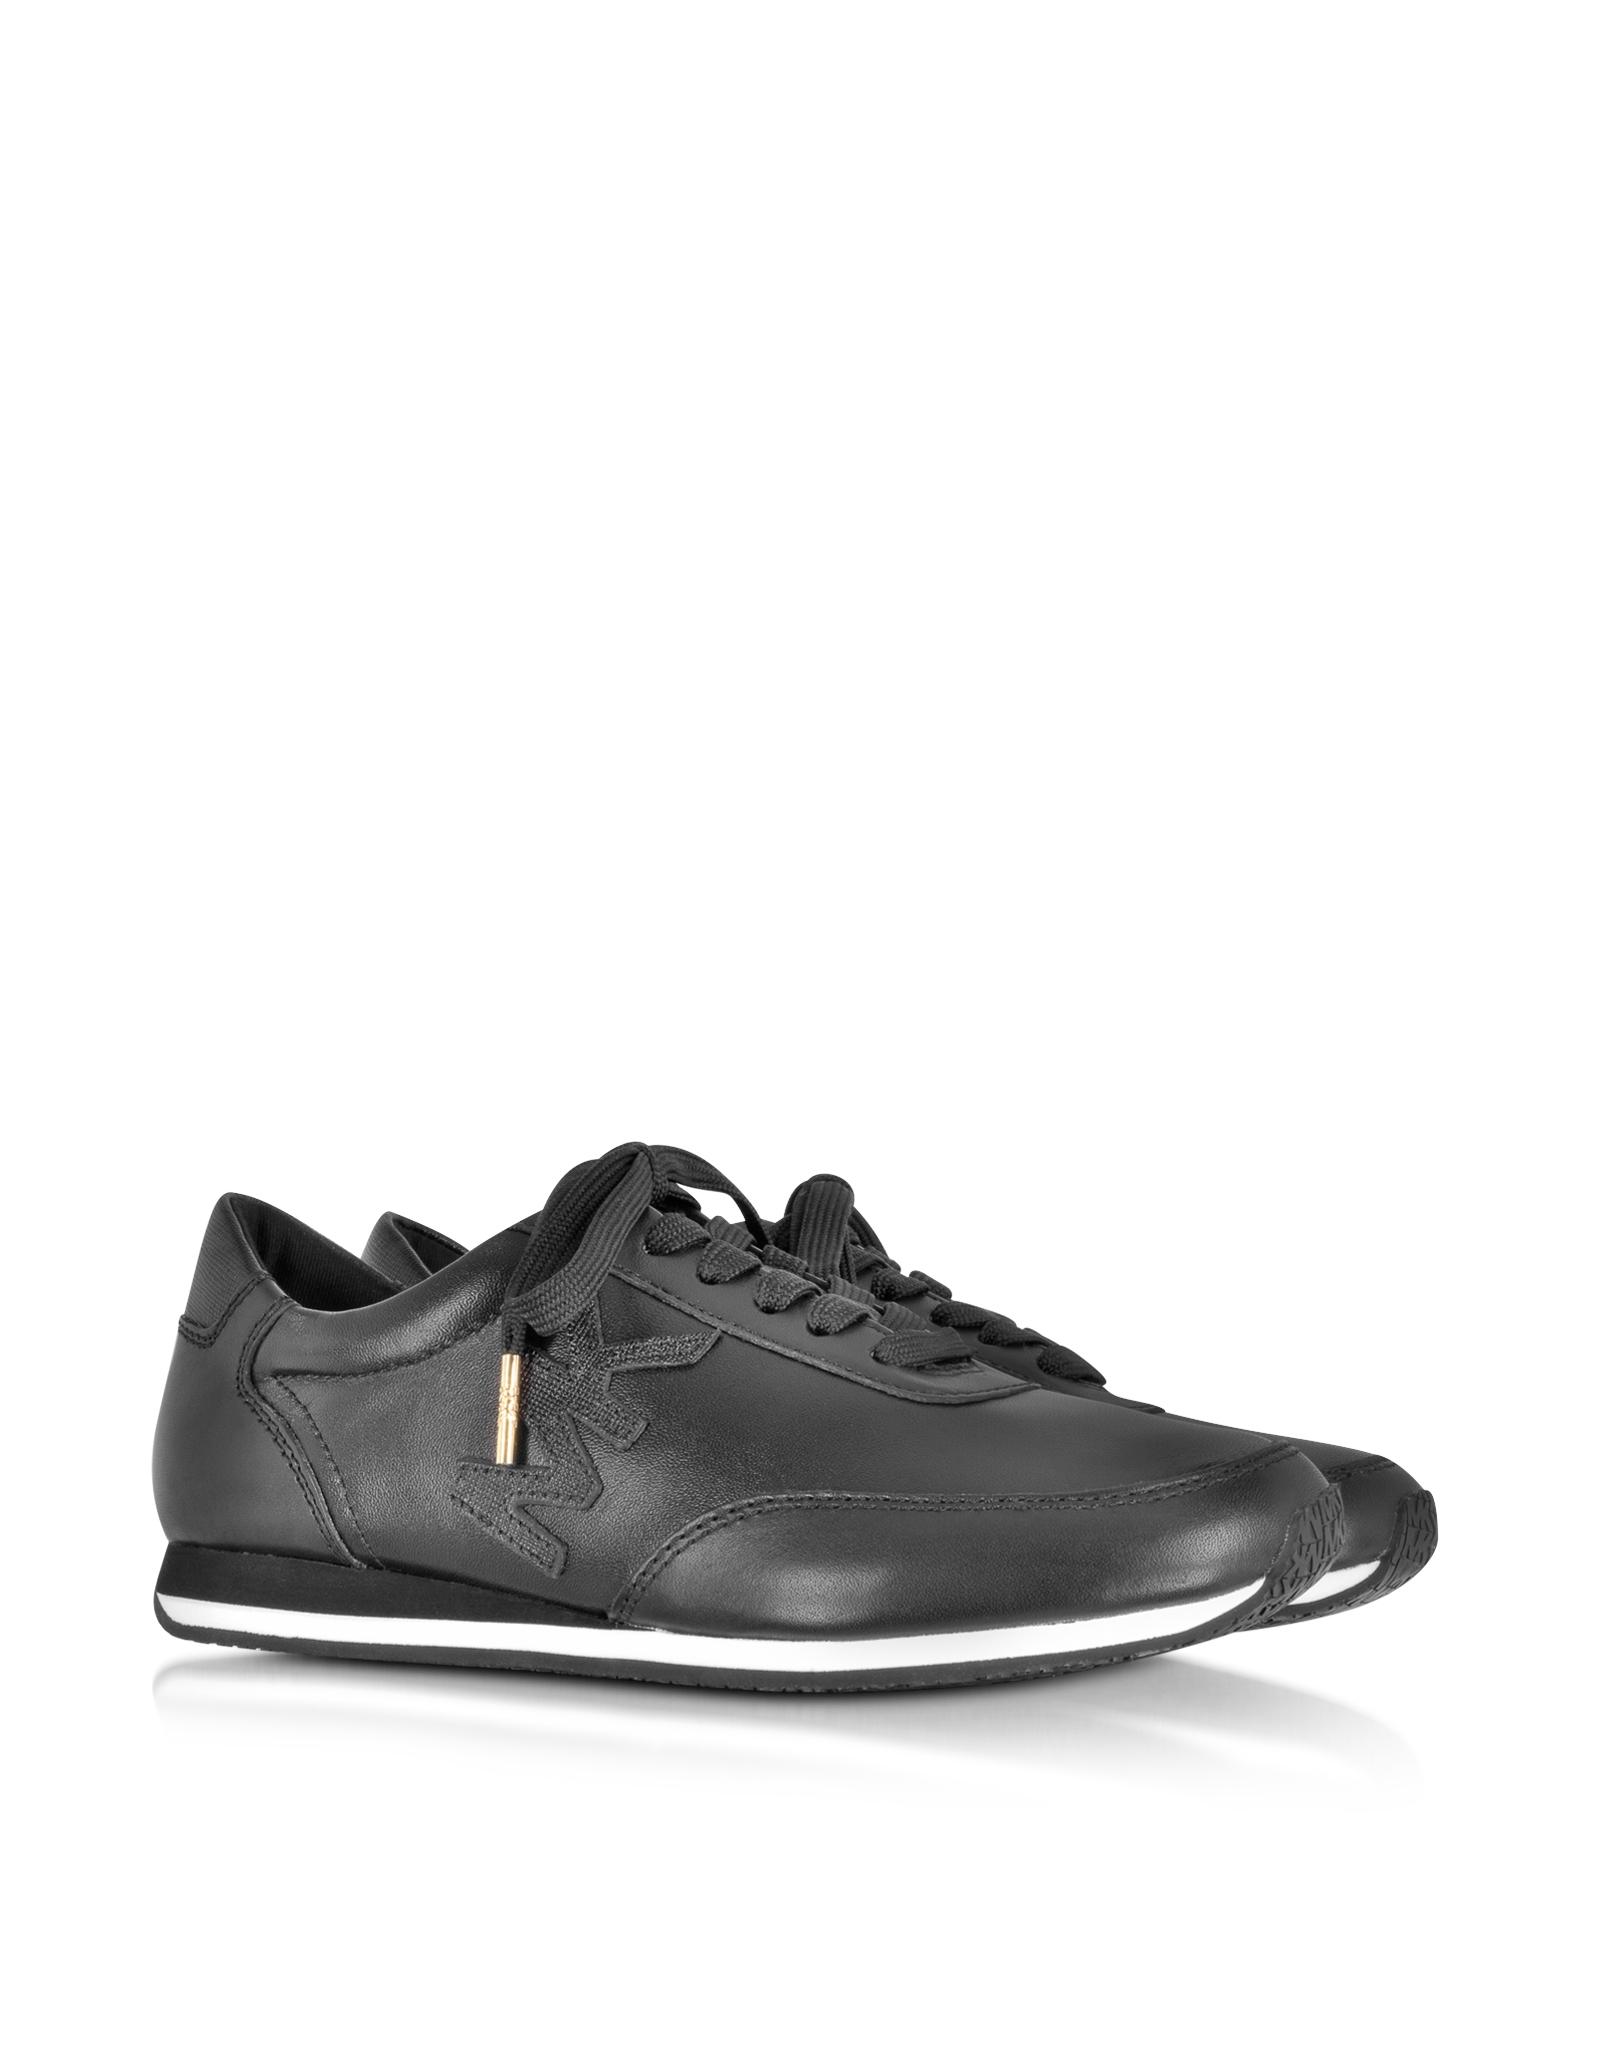 michael kors stanton active black leather sneaker in black lyst. Black Bedroom Furniture Sets. Home Design Ideas